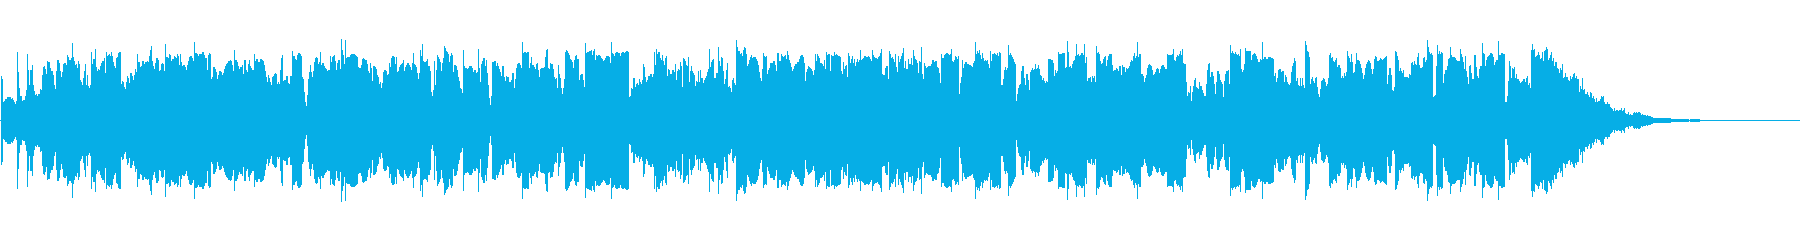 KANT近未来ロボットechoなしの再生済みの波形